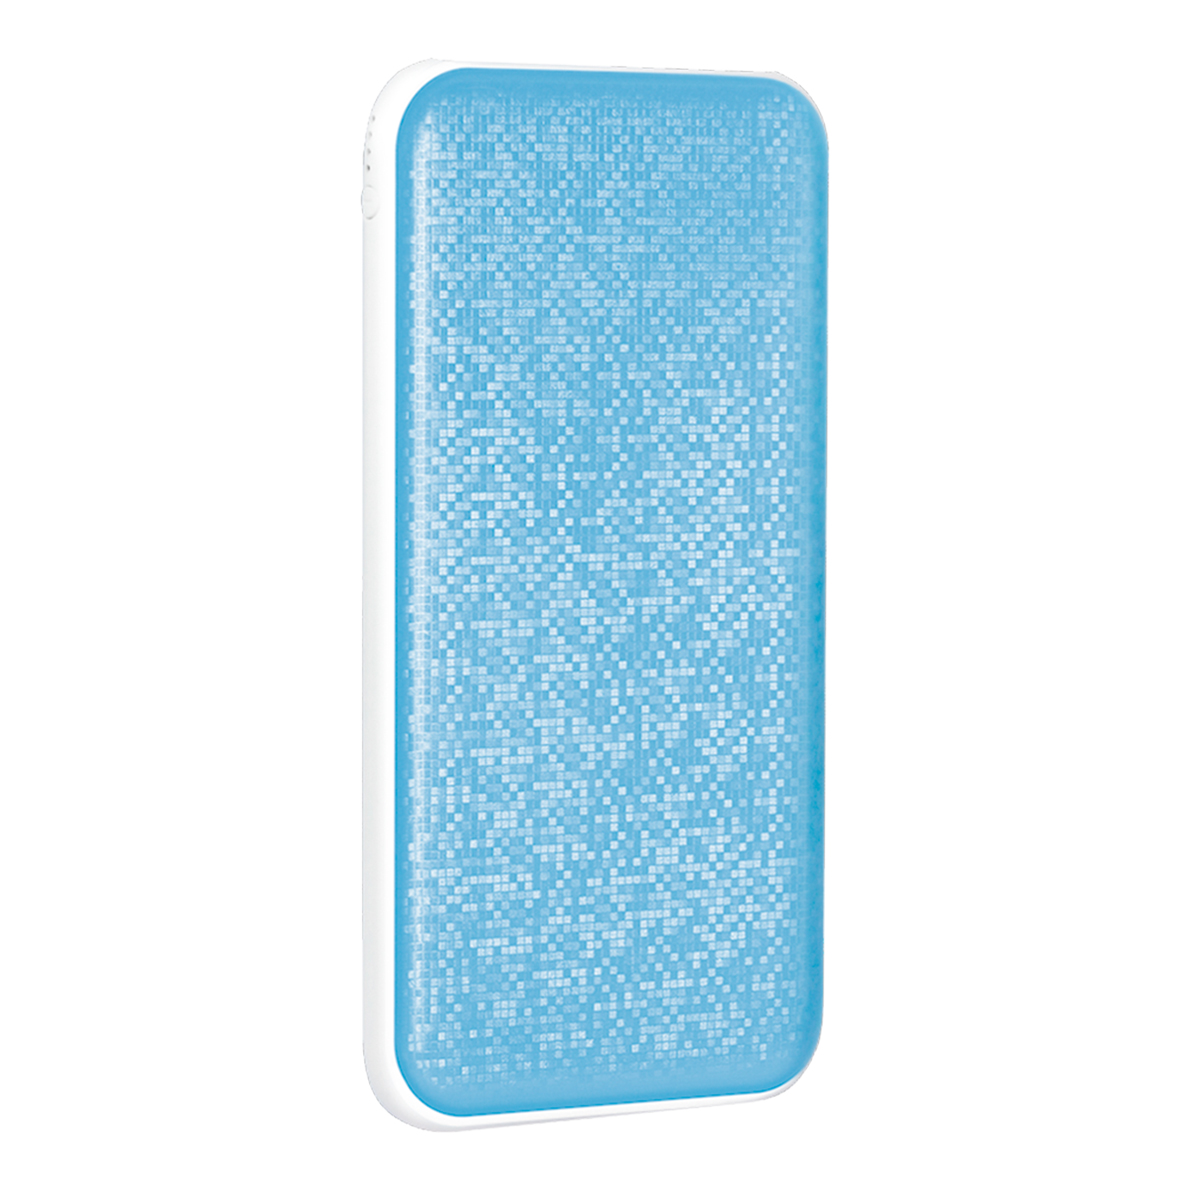 Nobby Pixel 030-001, Blue внешний аккумулятор (10 000мАч) аккумулятор nobby slim 025 001 4000 mah usb 1 2а black 09282